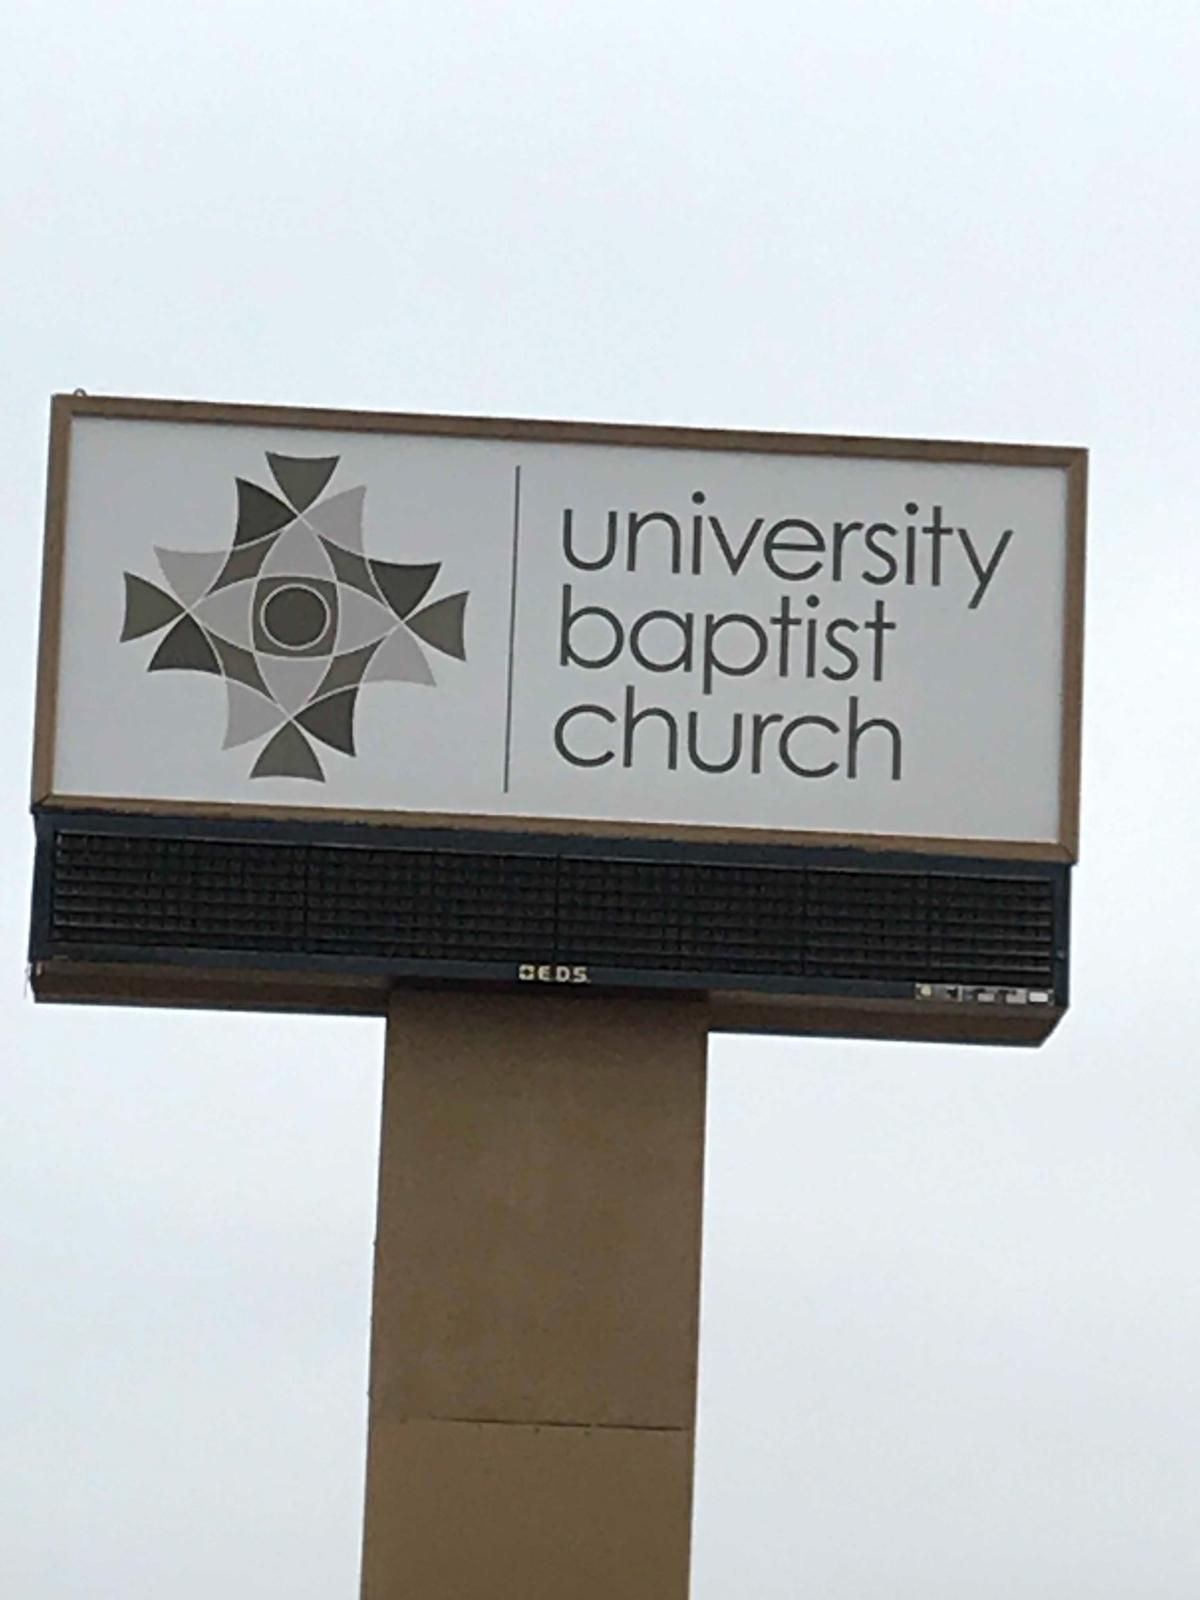 University Baptist Church welcomesstudents